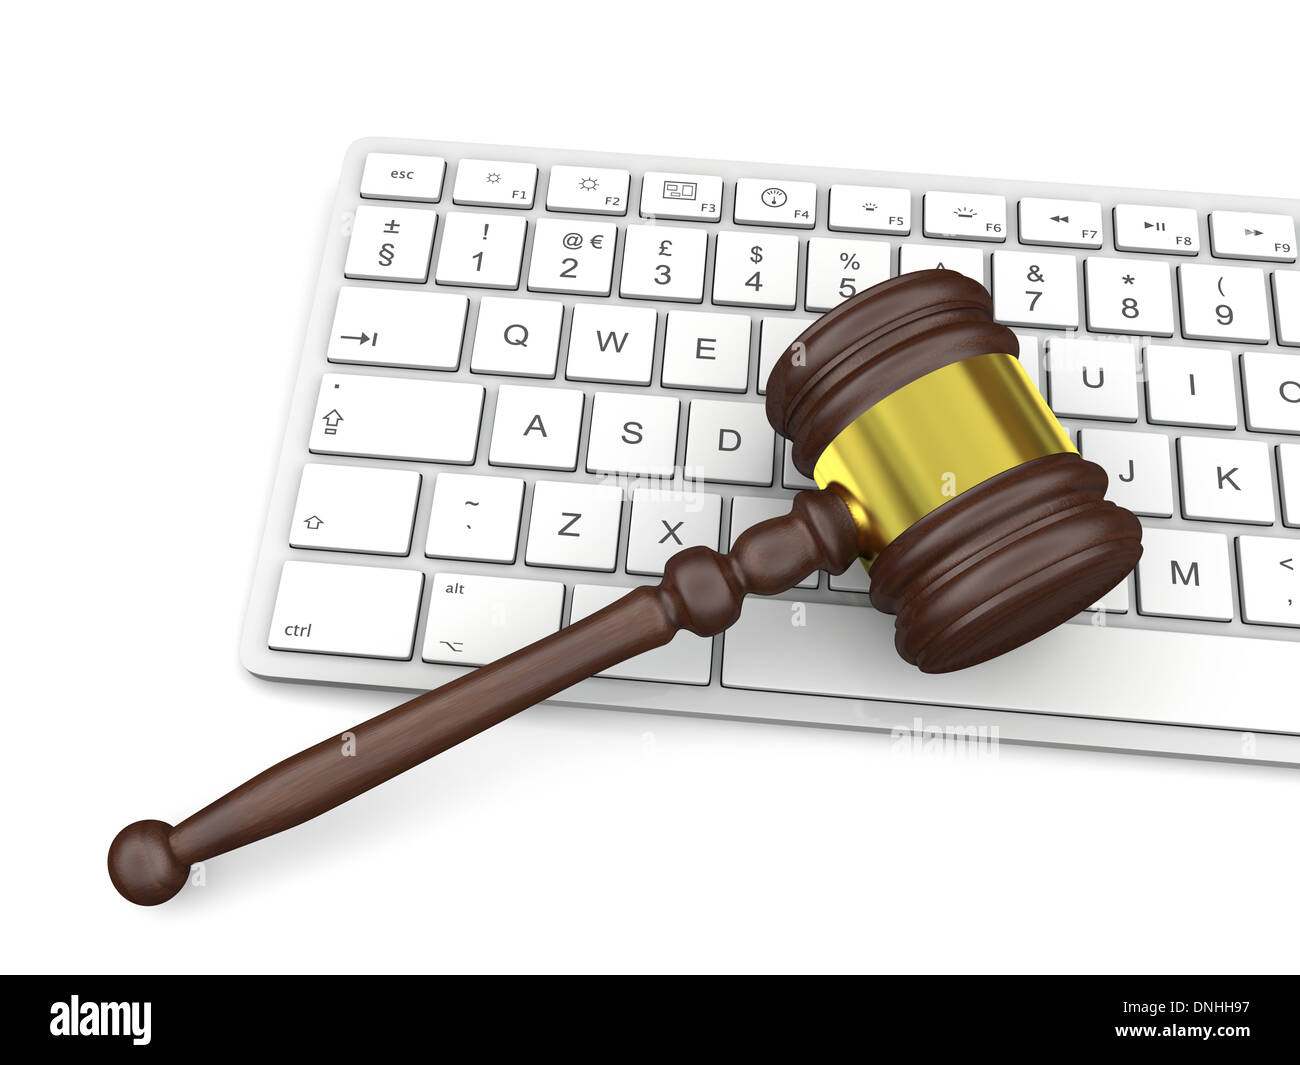 Wooden gavel on computer keyboard symbol of law and justice in wooden gavel on computer keyboard symbol of law and justice in technology biocorpaavc